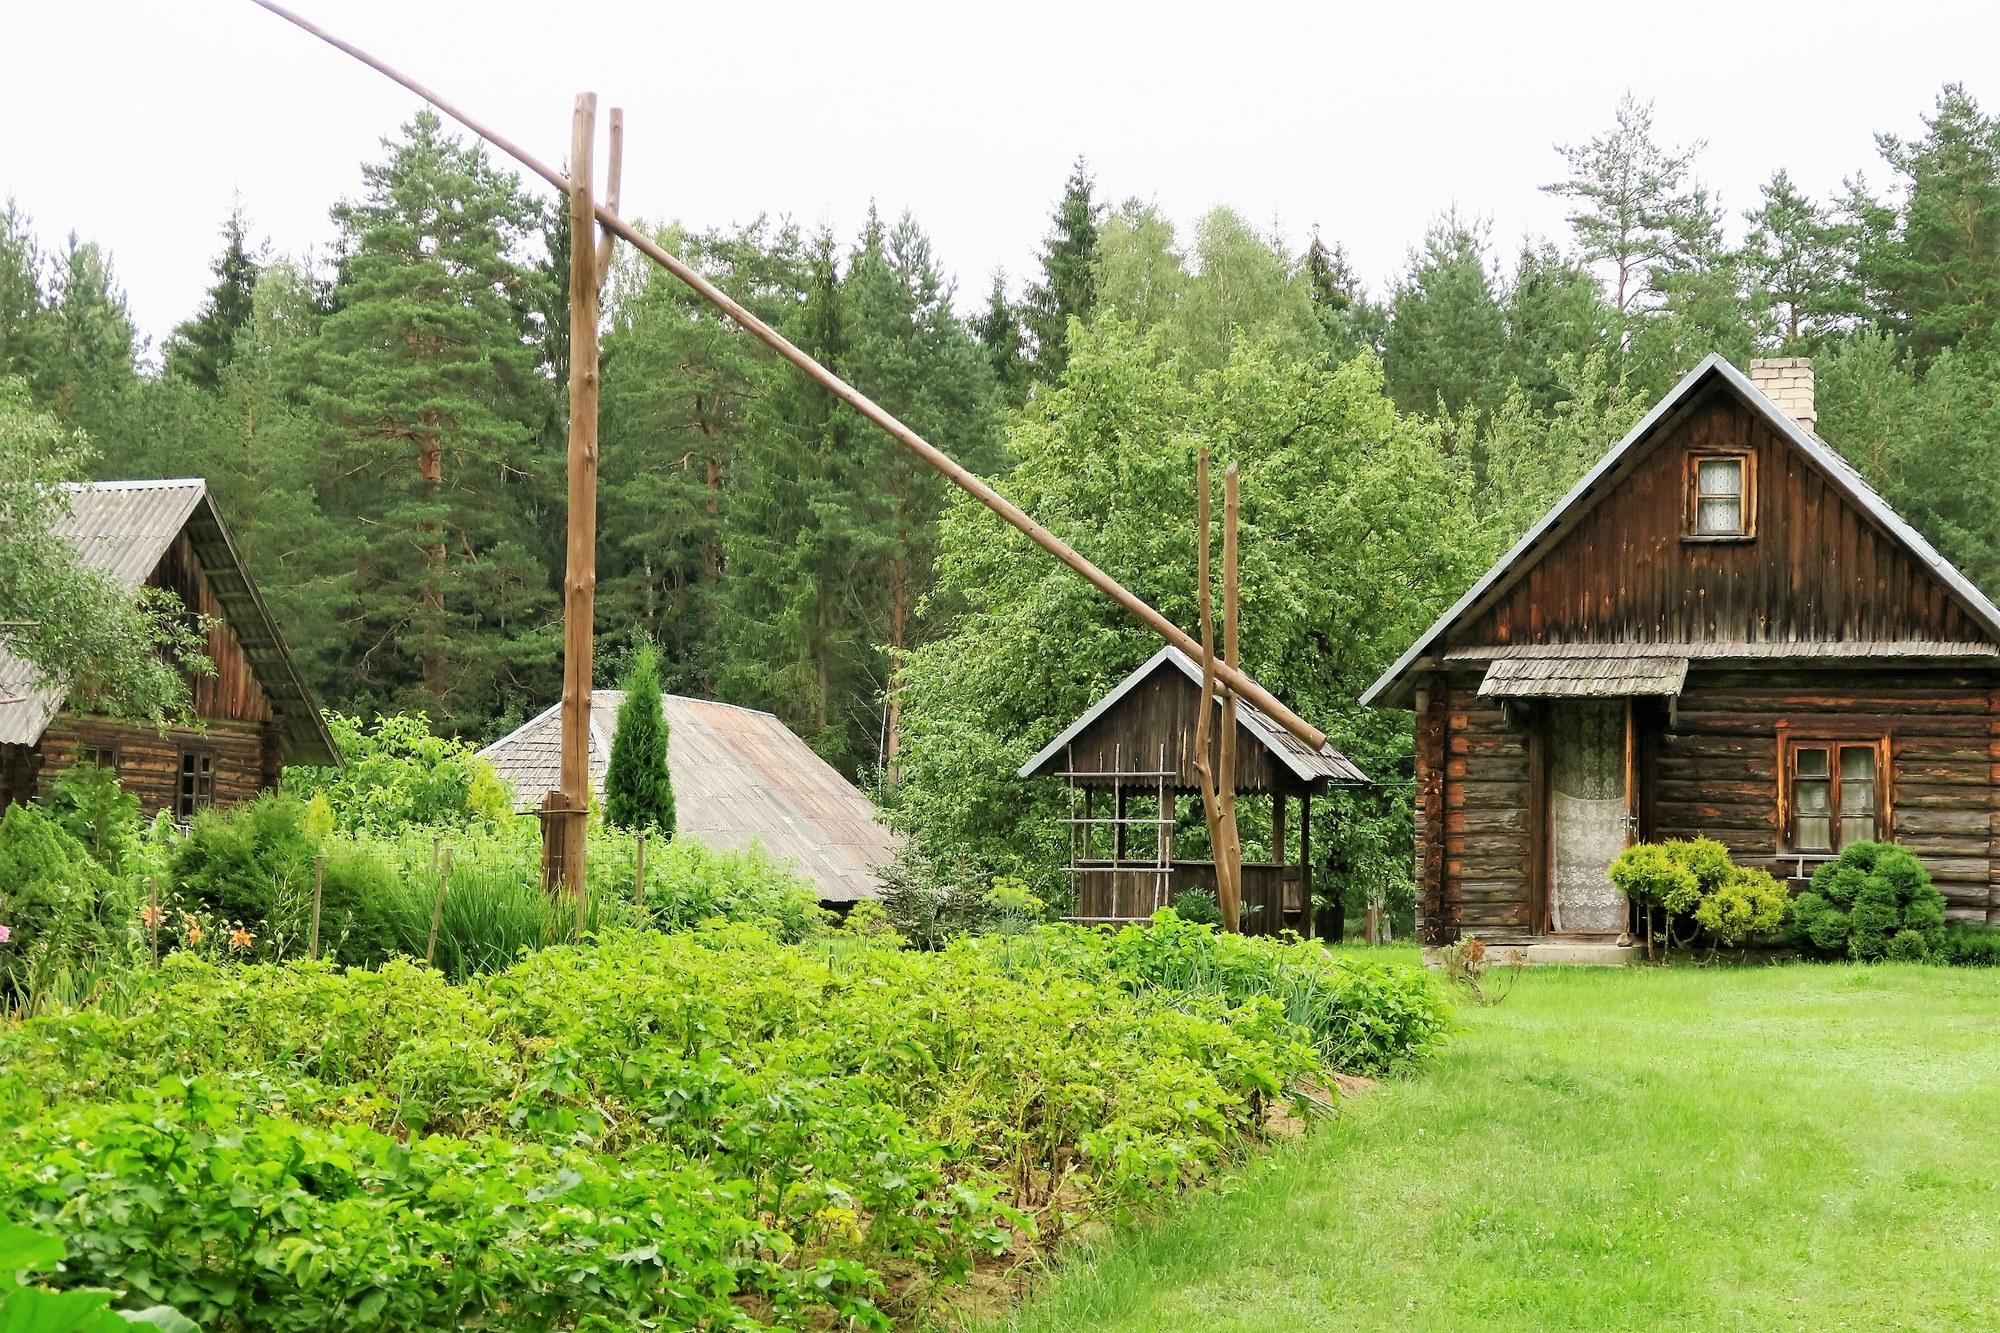 Maison à Vaišnoriskeš